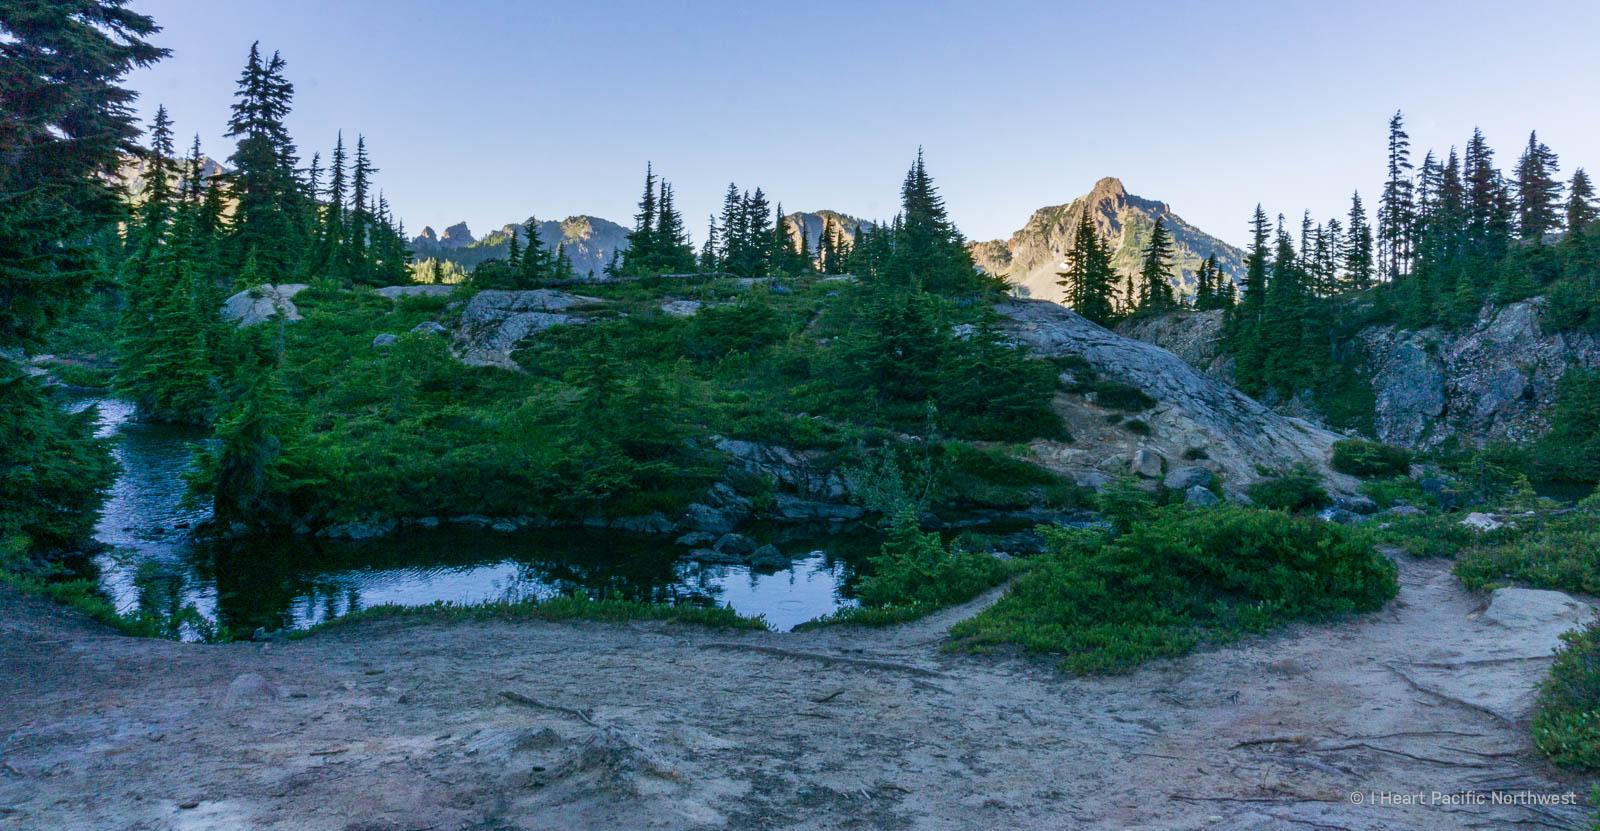 Alpine Lakes Wilderness - Rampart Lakes backpacking trip